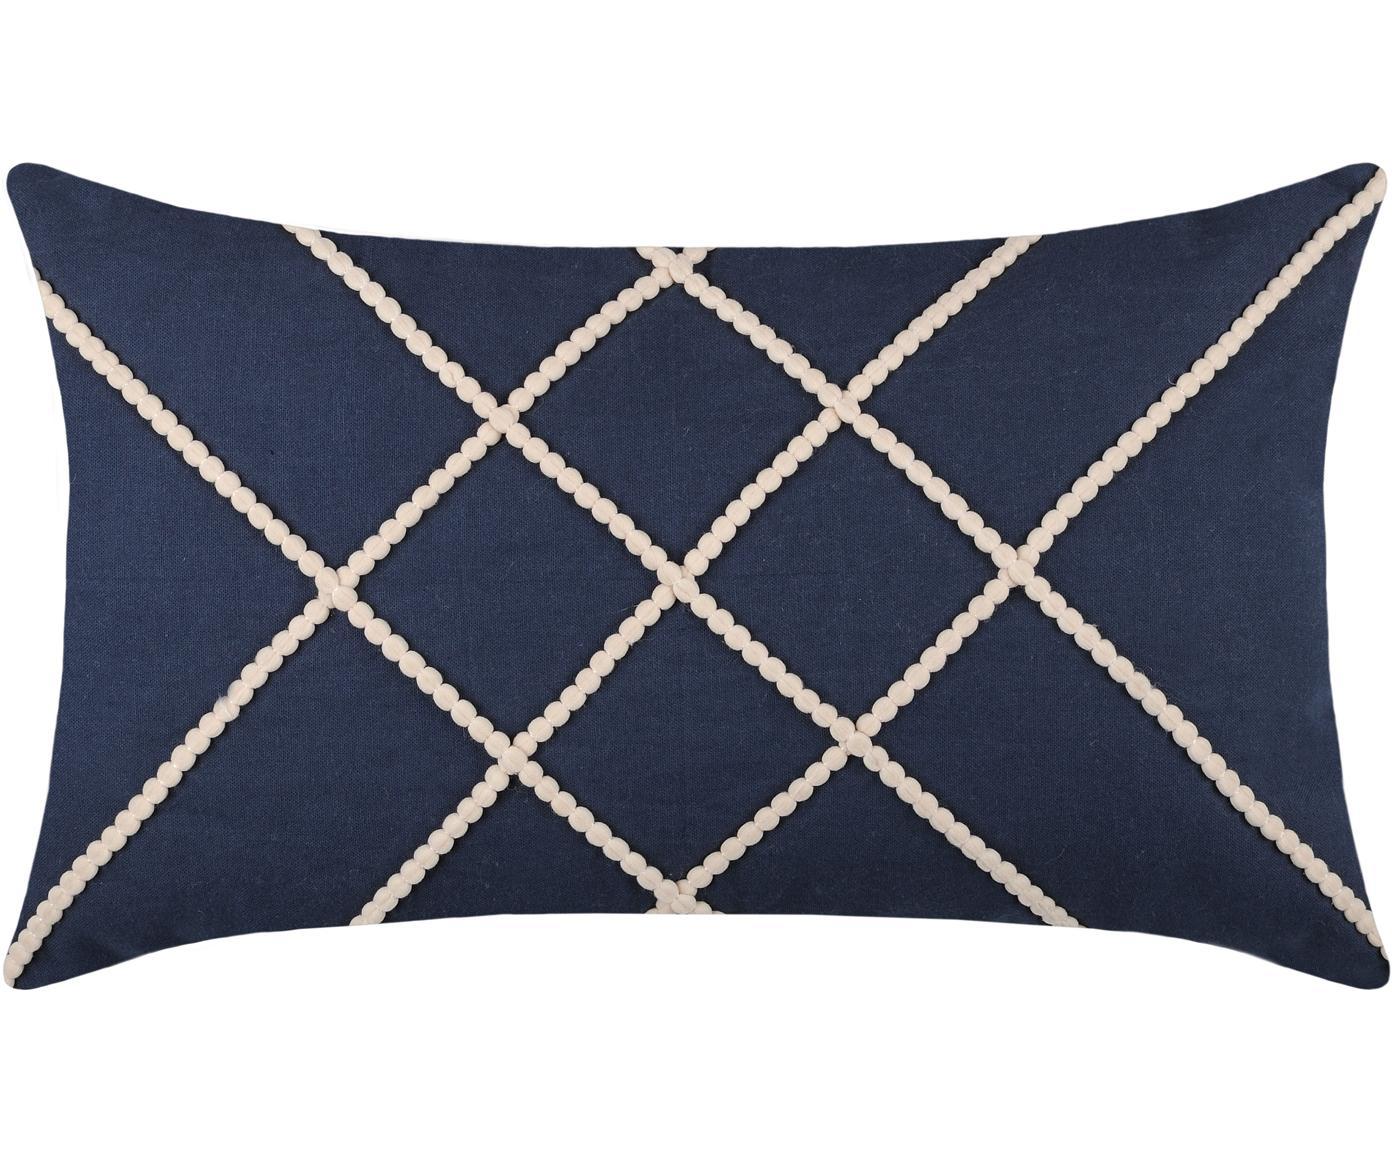 Kussen Concarneau Stripe, met vulling, Katoen, Donkerblauw, 30 x 50 cm